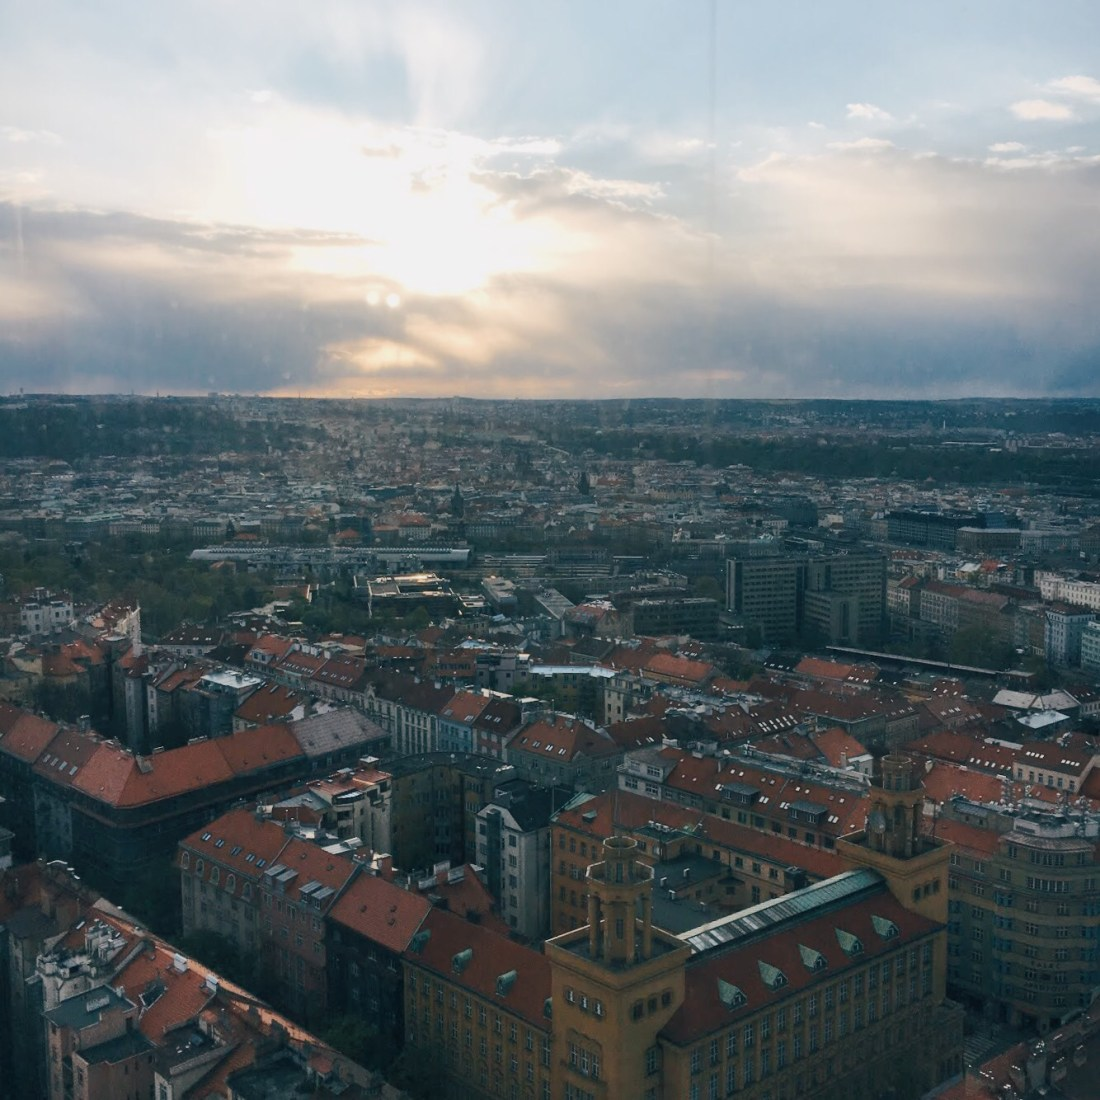 View from Prague Zizkov radio tower